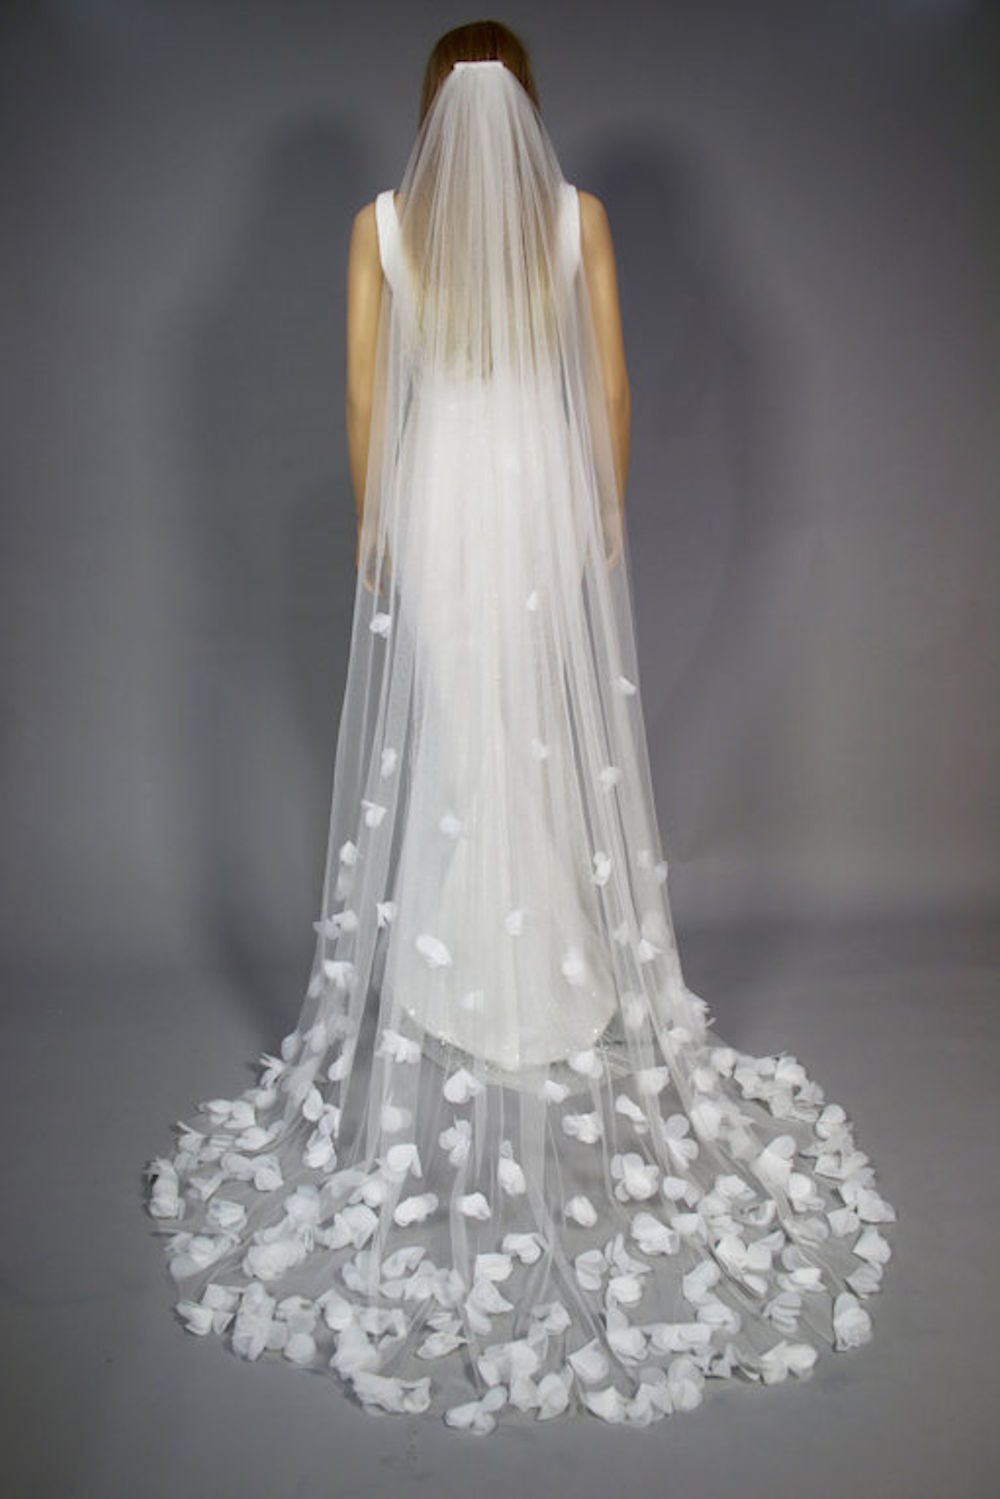 Fara - Bridal Veils Melbourne